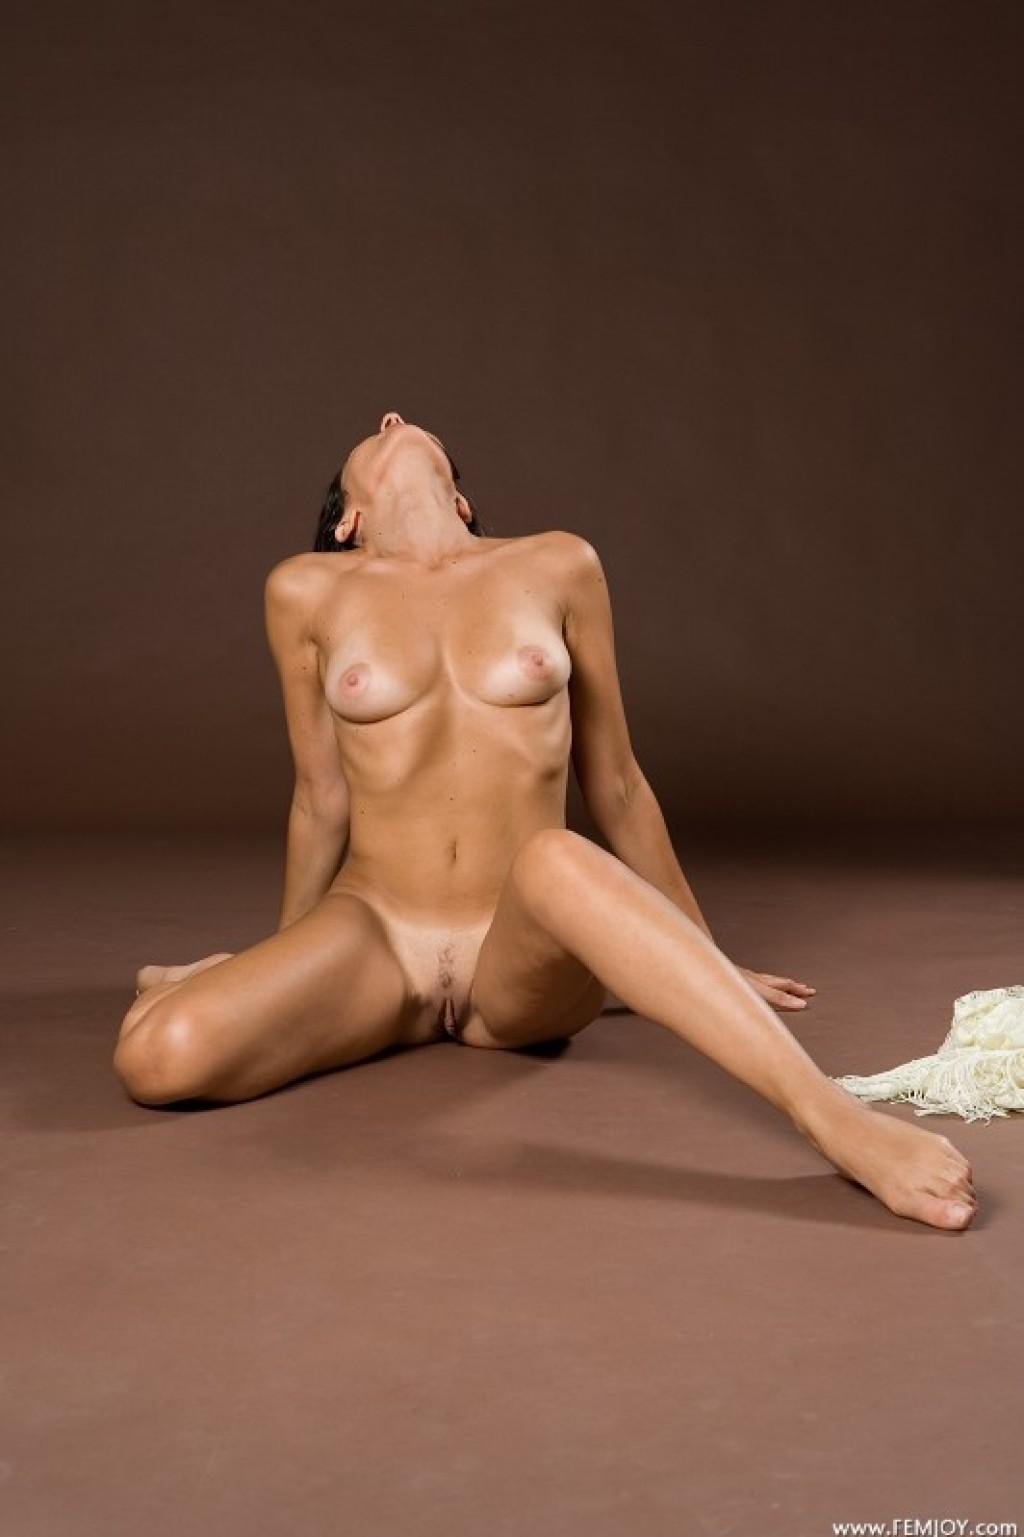 Chiara nude pics in Magic Of Curves shot by Lorenzo Renzi